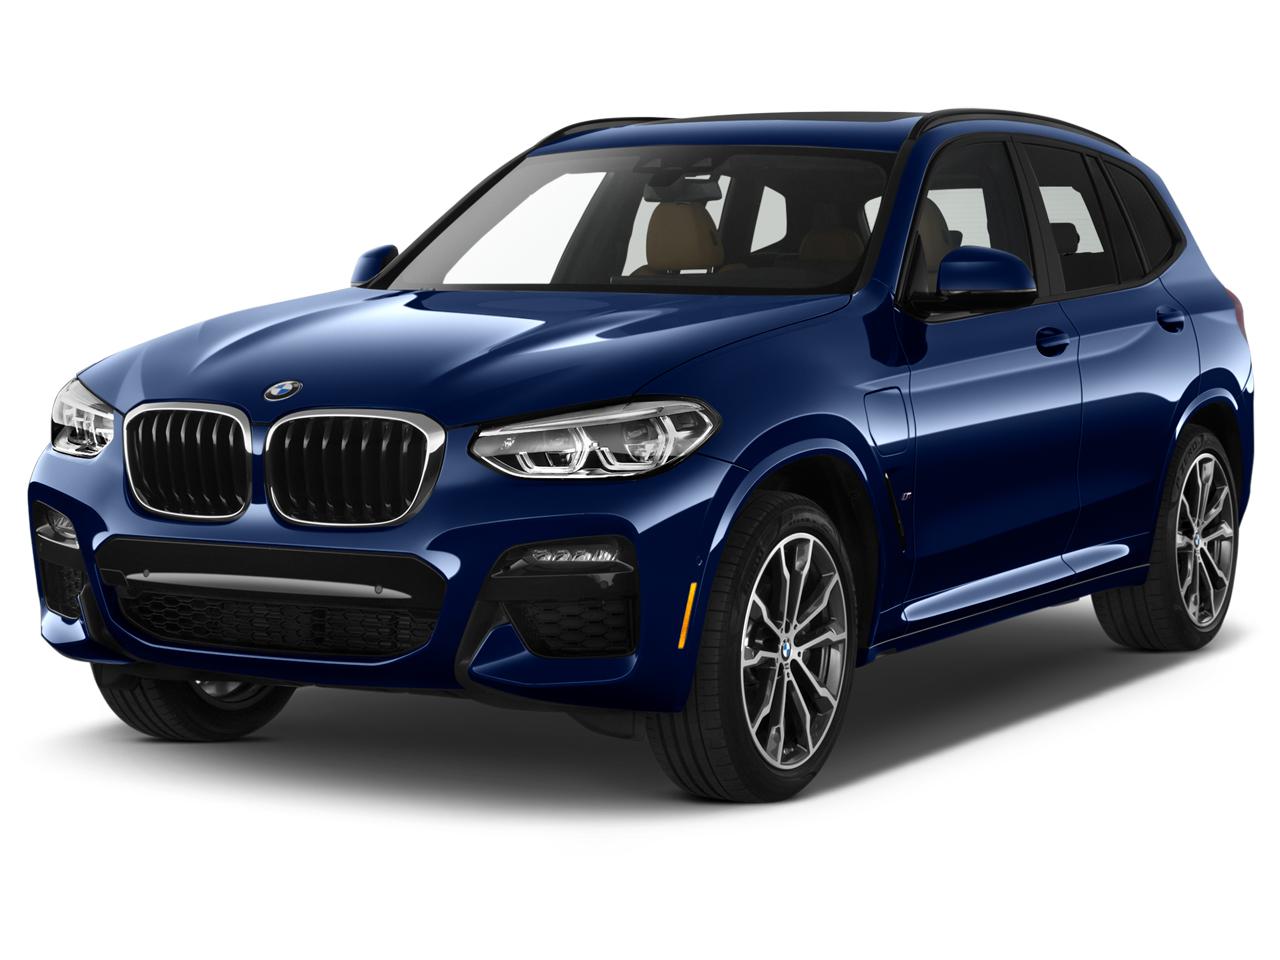 2021 BMW X3 Hybrid Picture